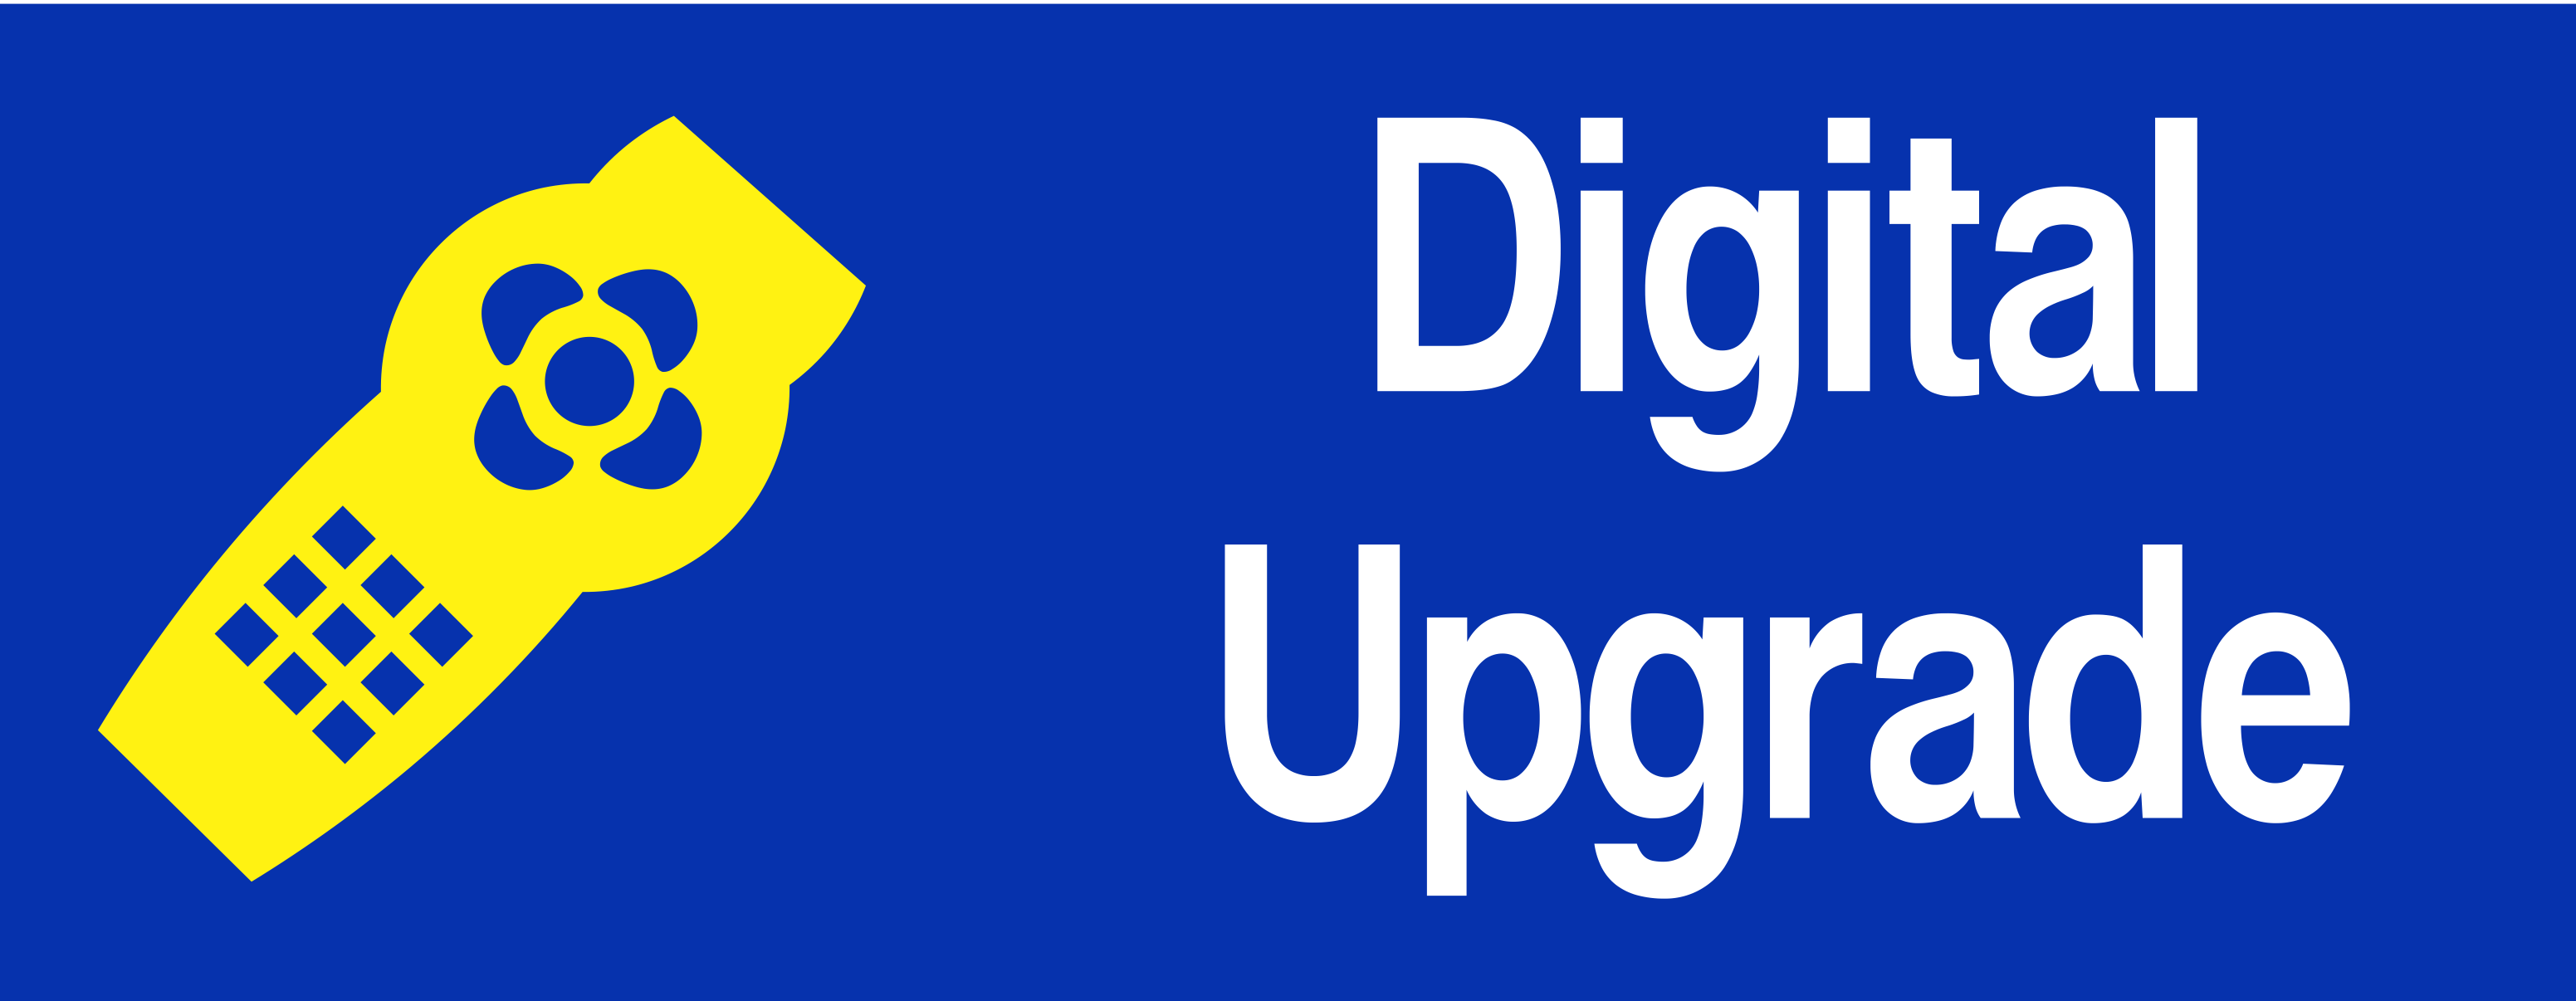 abx-albury-digital-upgrade